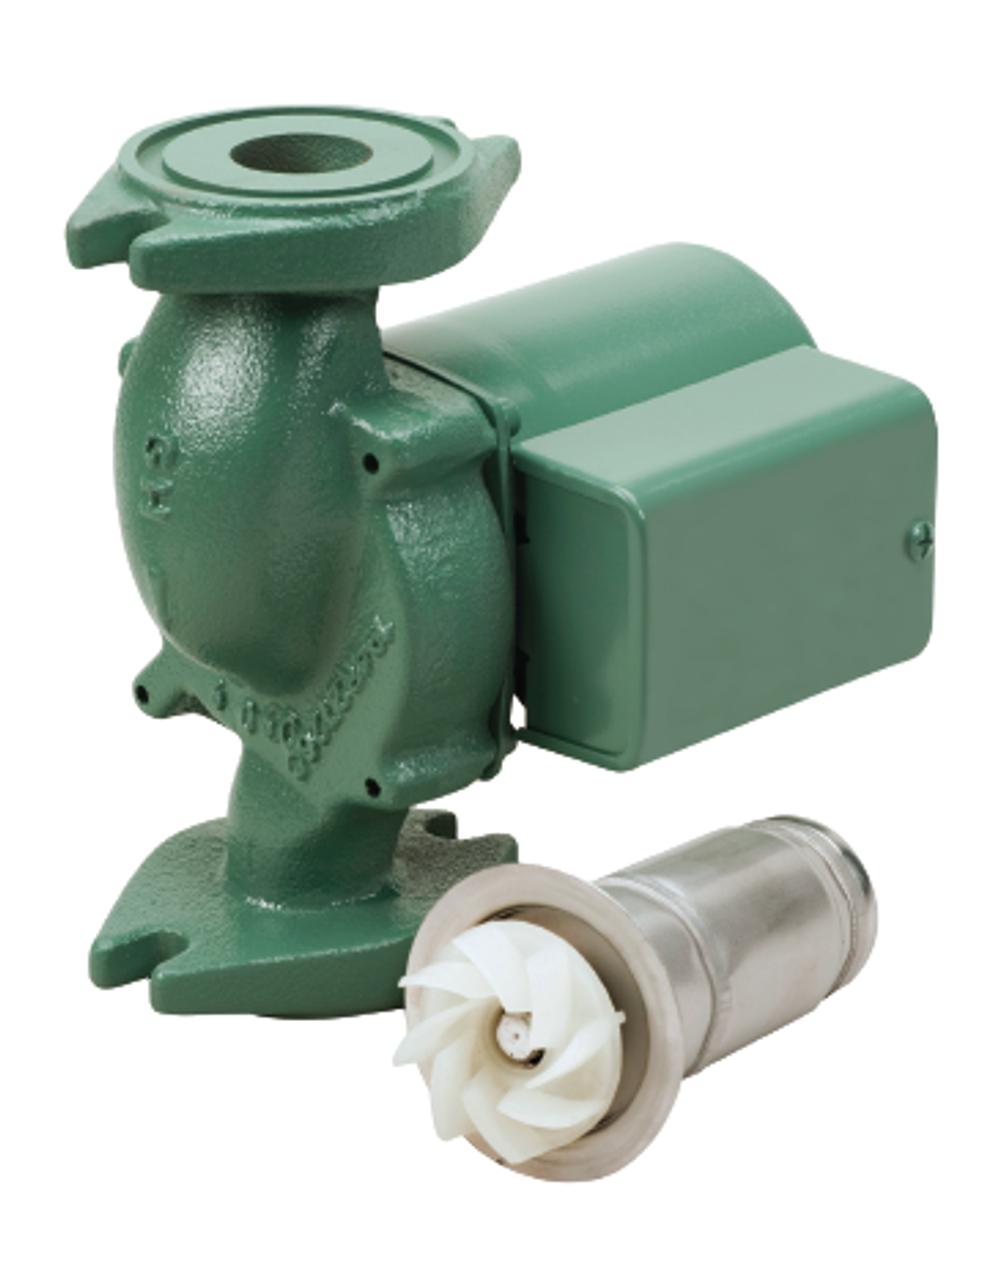 005-F2 Taco Cast Iron Pump With 1/35 HP on taco aquastat wiring, taco controller wiring, taco pump wiring, taco controls wiring, taco zone valve wiring diagram, taco relay wiring,